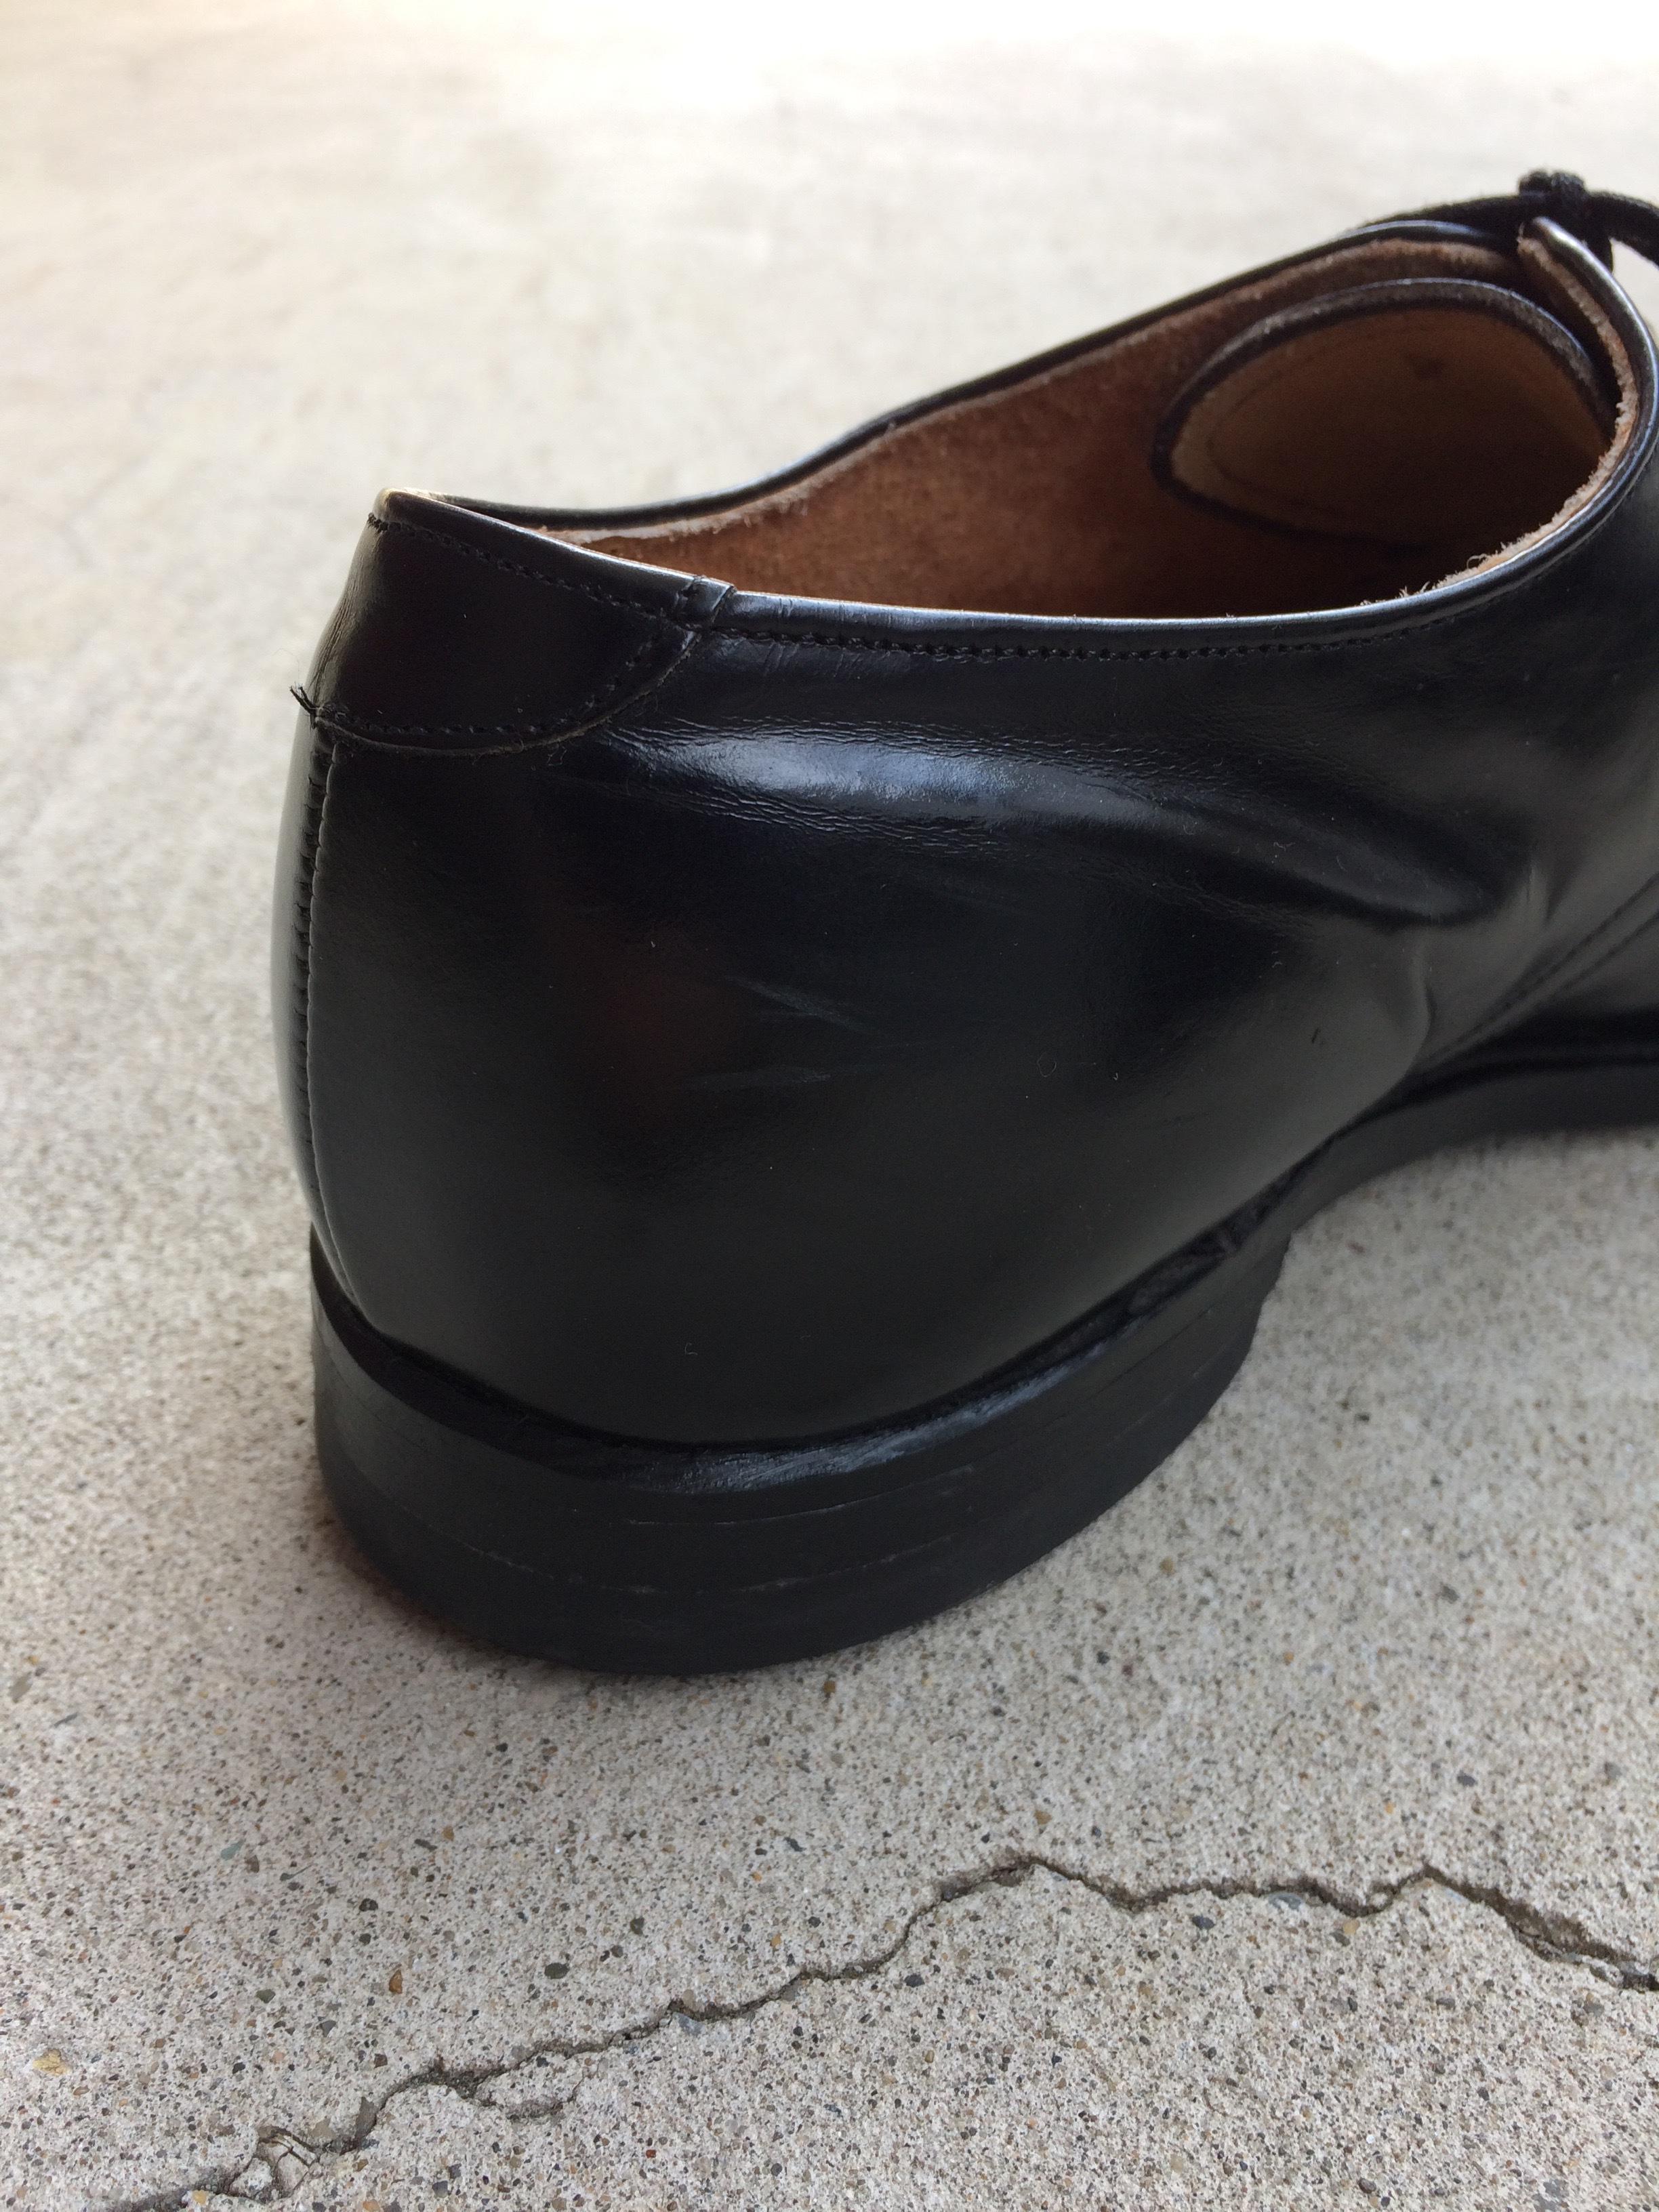 80s U.S Navy Service shoes  9 1/2 W